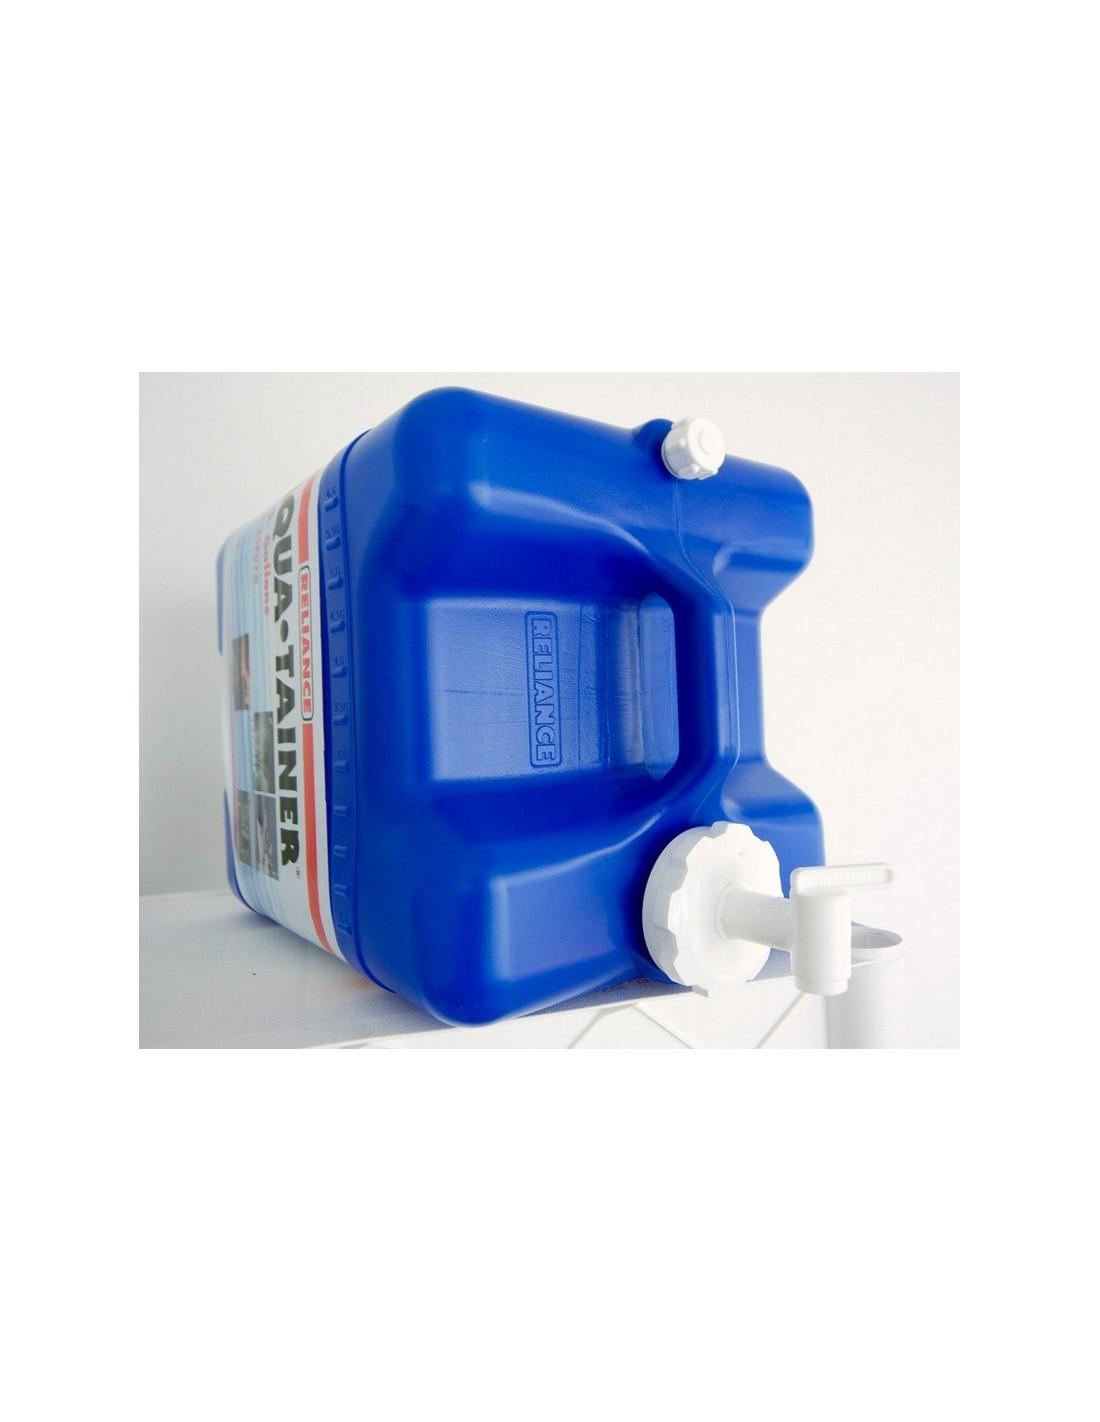 Paratum bid n 26 l agua potable aqua tainer for Bidones para agua